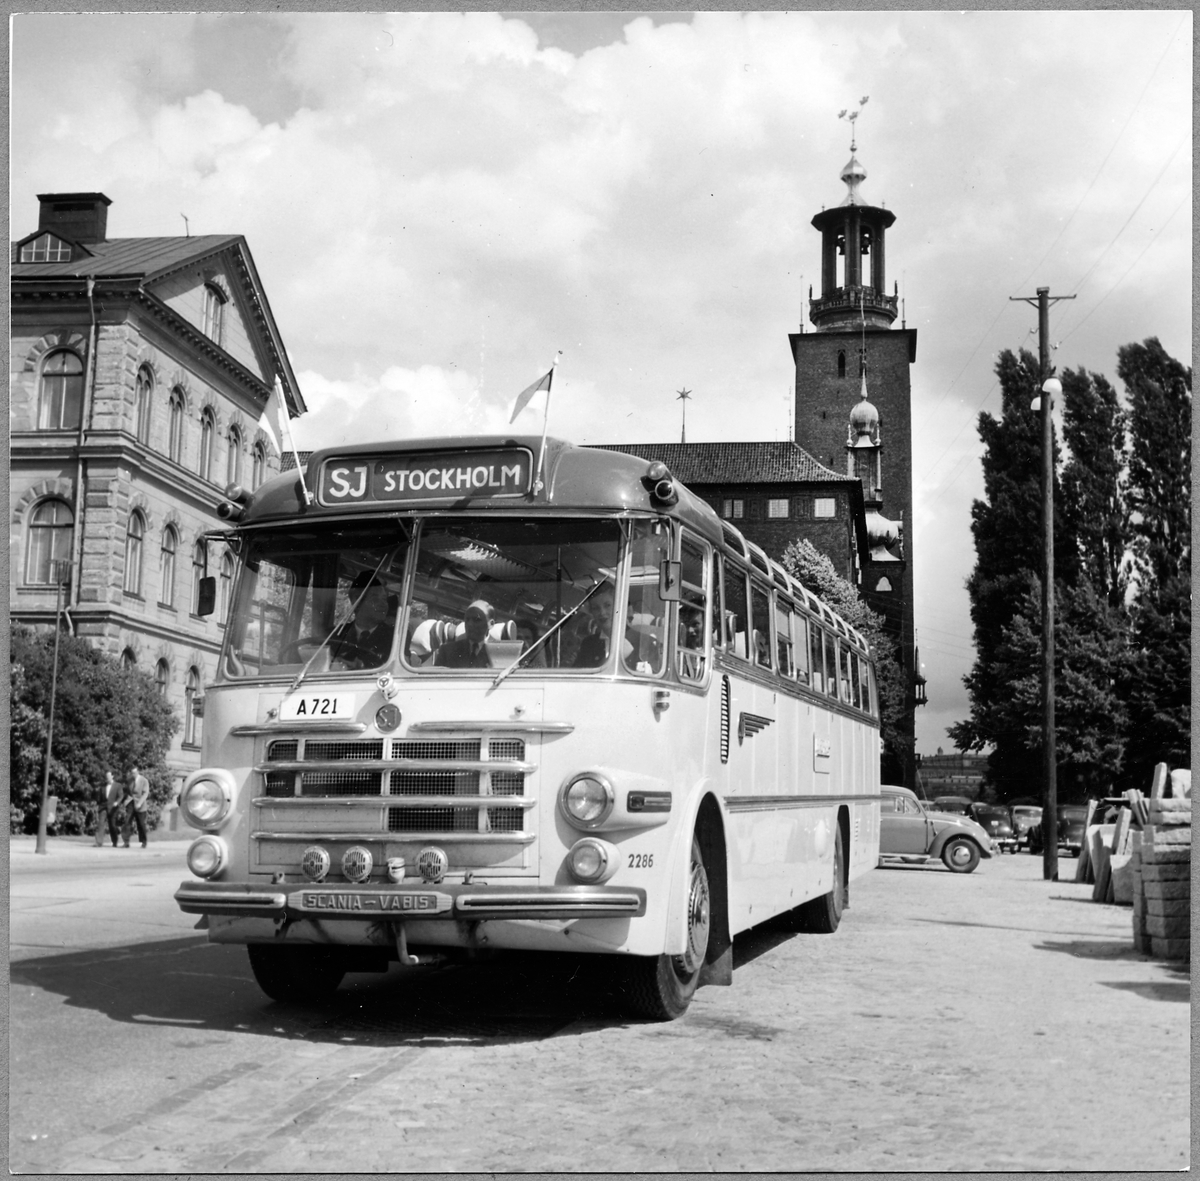 AEC Regal MK III B1 turistbuss. (AB Linjebuss International). Statens Järnvägar, SJ buss 2286.